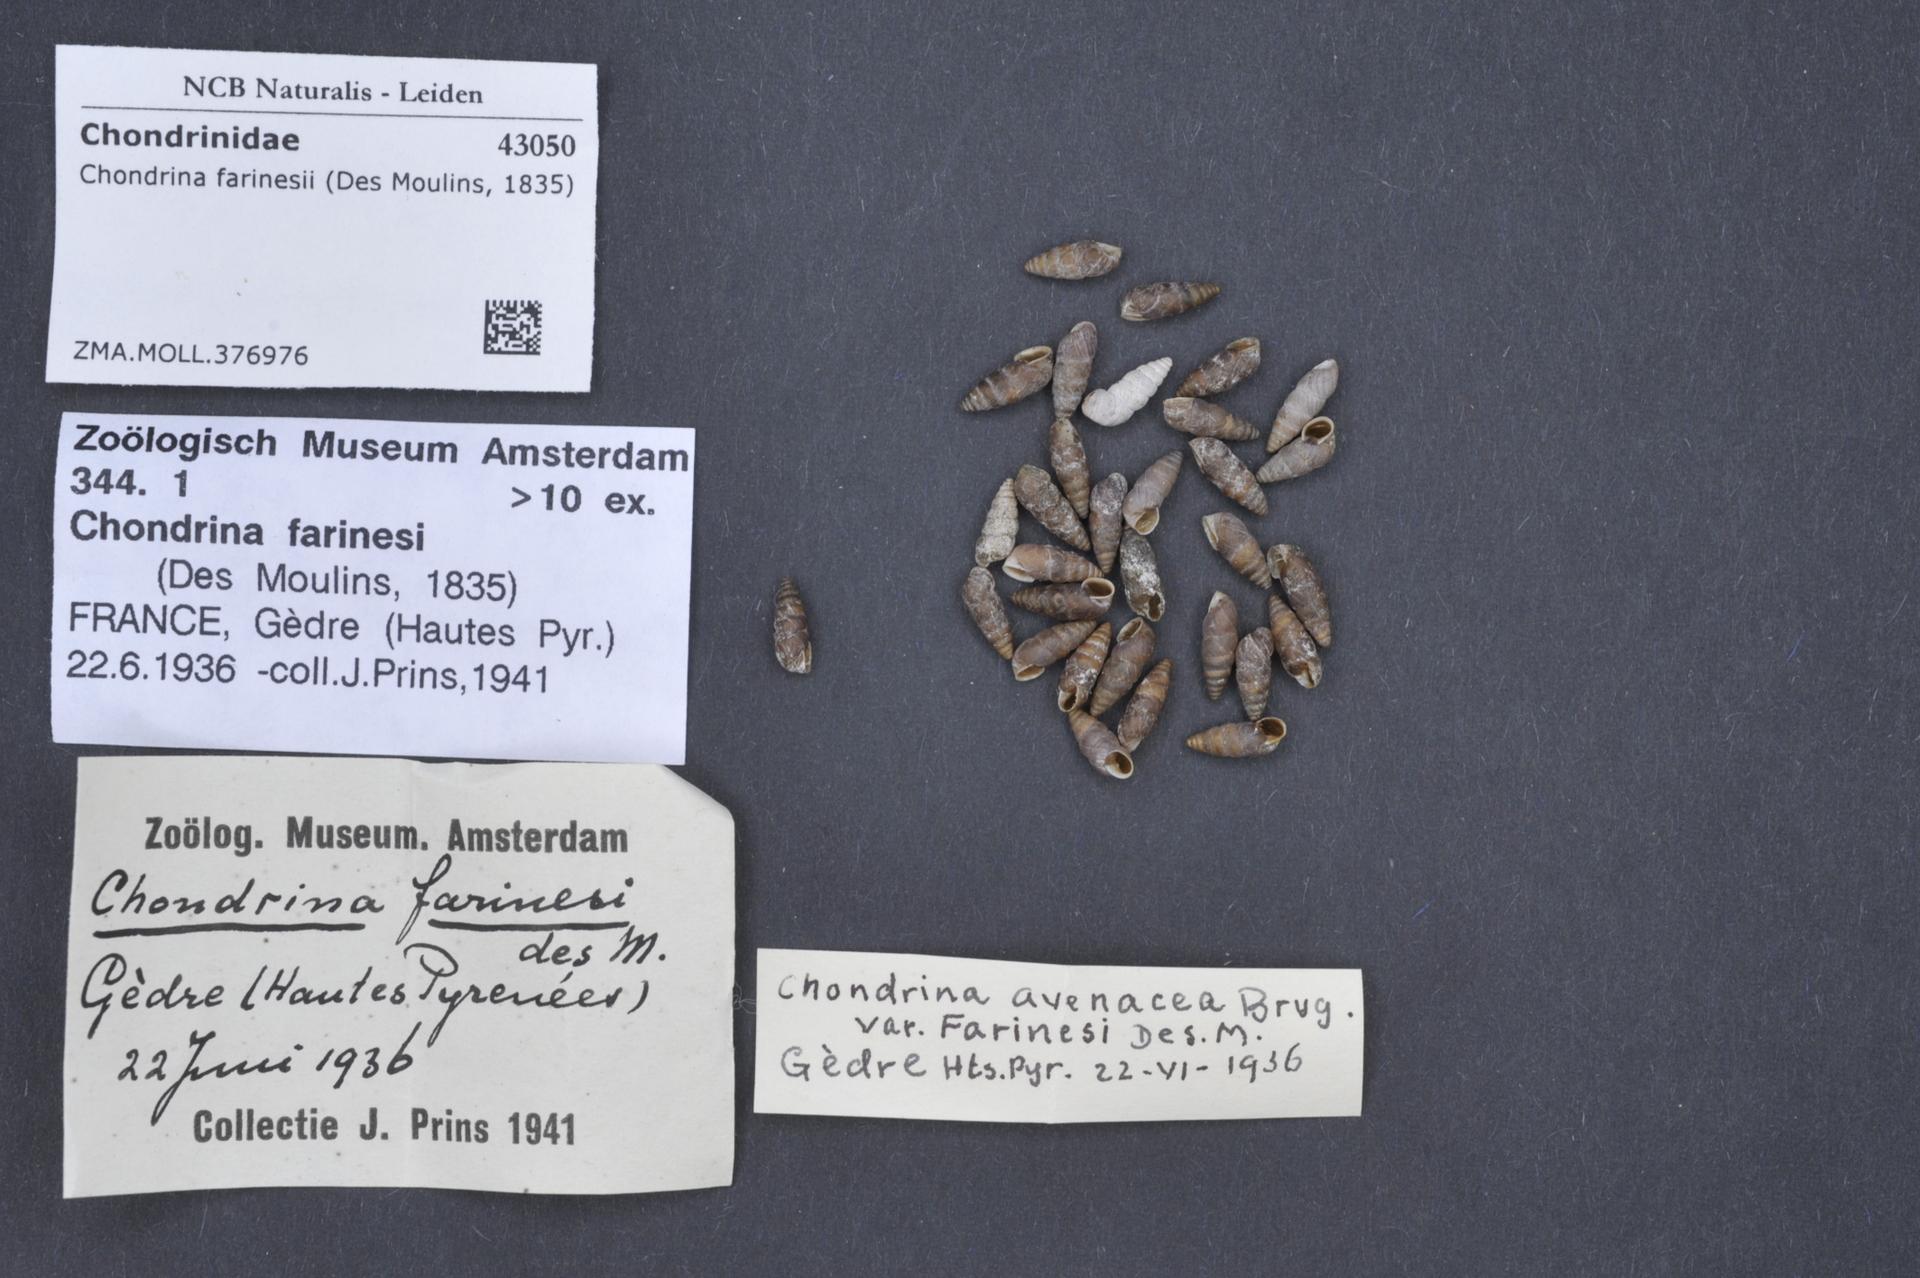 ZMA.MOLL.376976   Chondrina farinesii (Des Moulins, 1835)